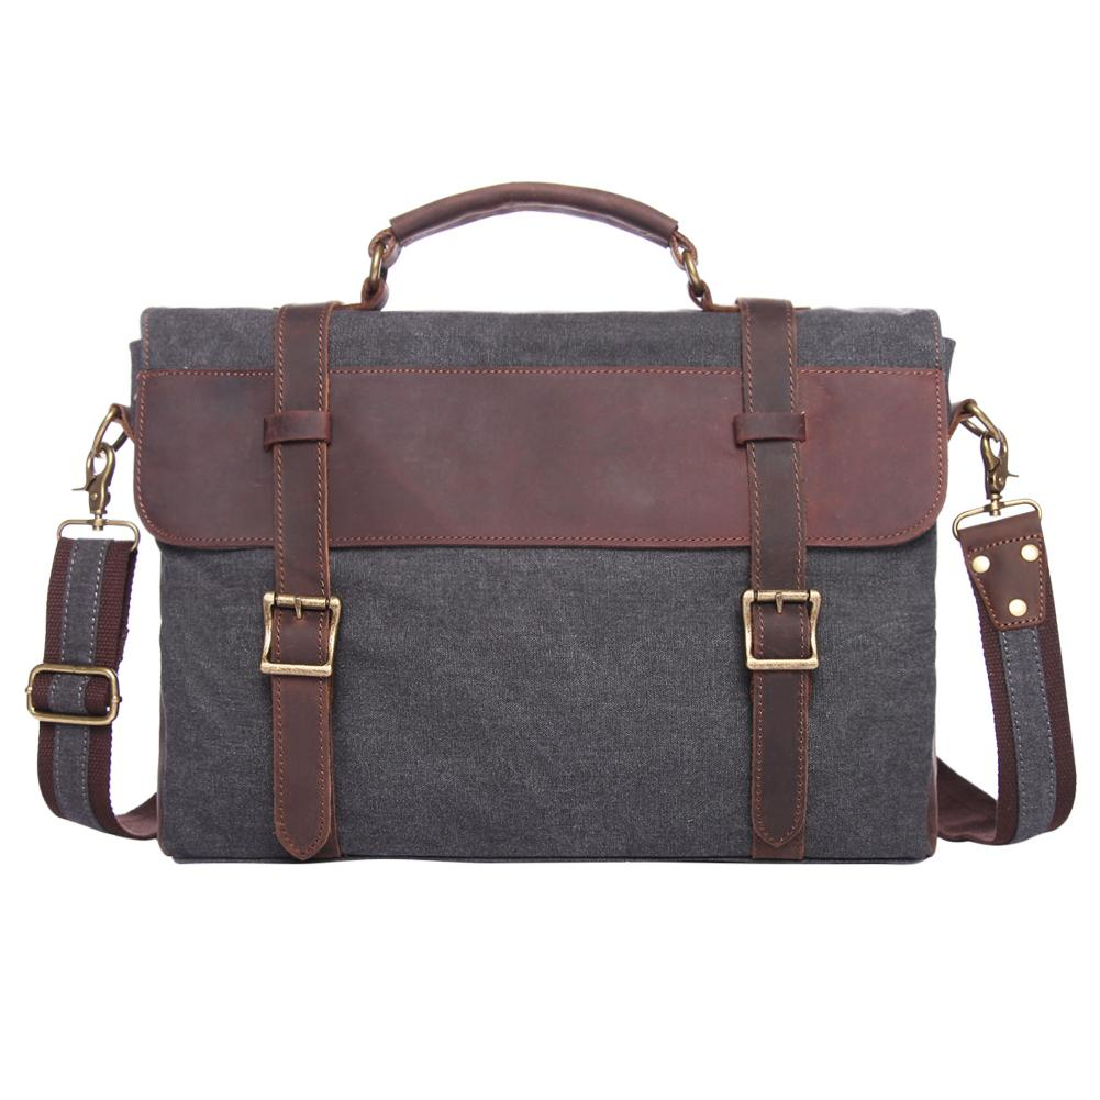 71df412c236 Vintage Crazy Horse Leather & Canvas Computer Handbag Business ...